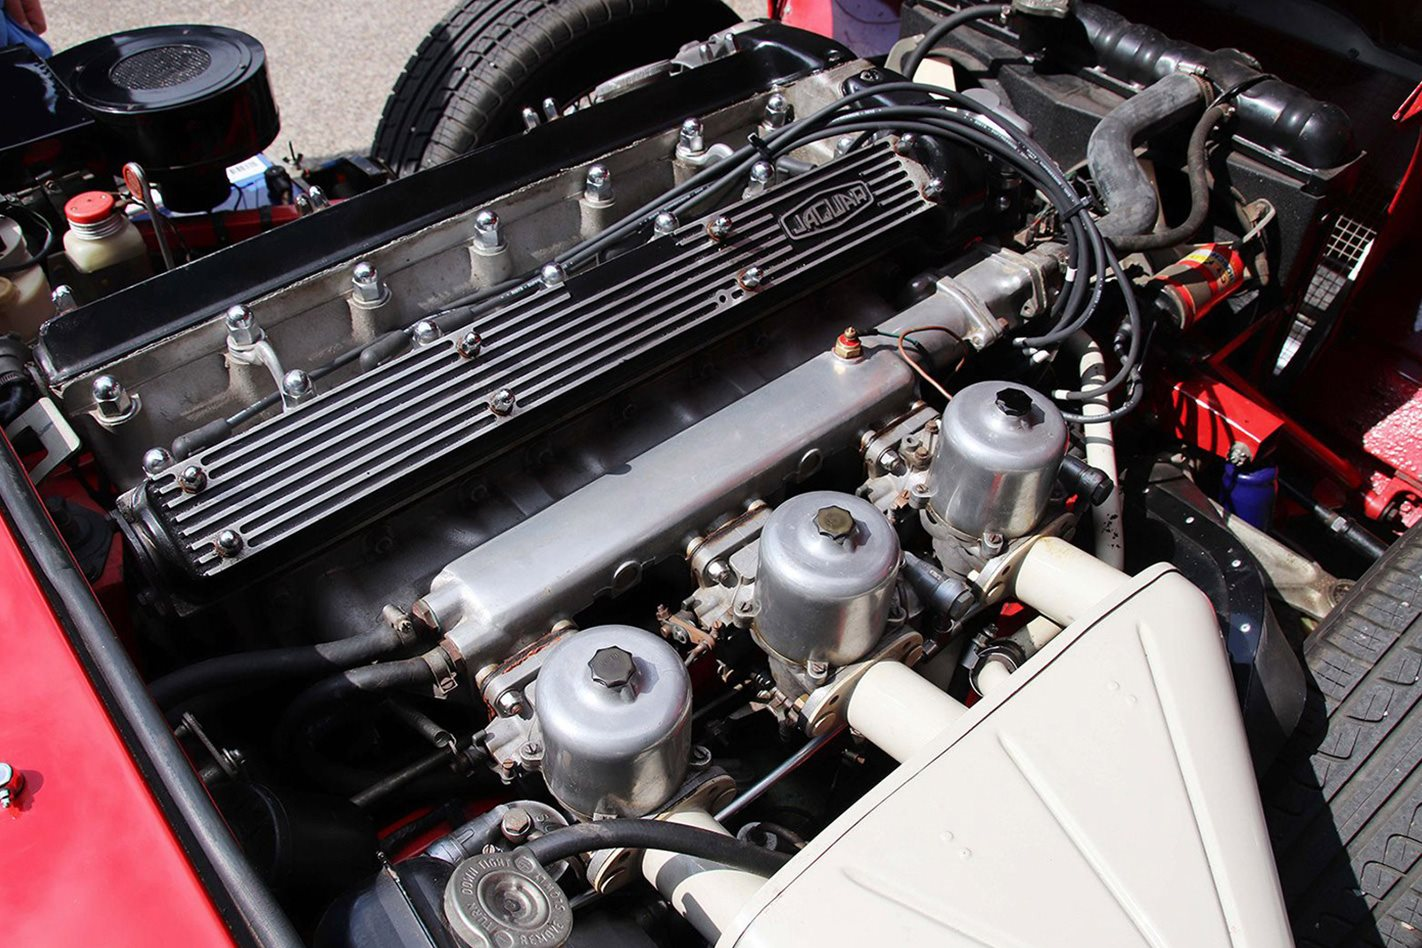 1970-Jaguar-E-type-42-Series-2-roadster-engine.jpg